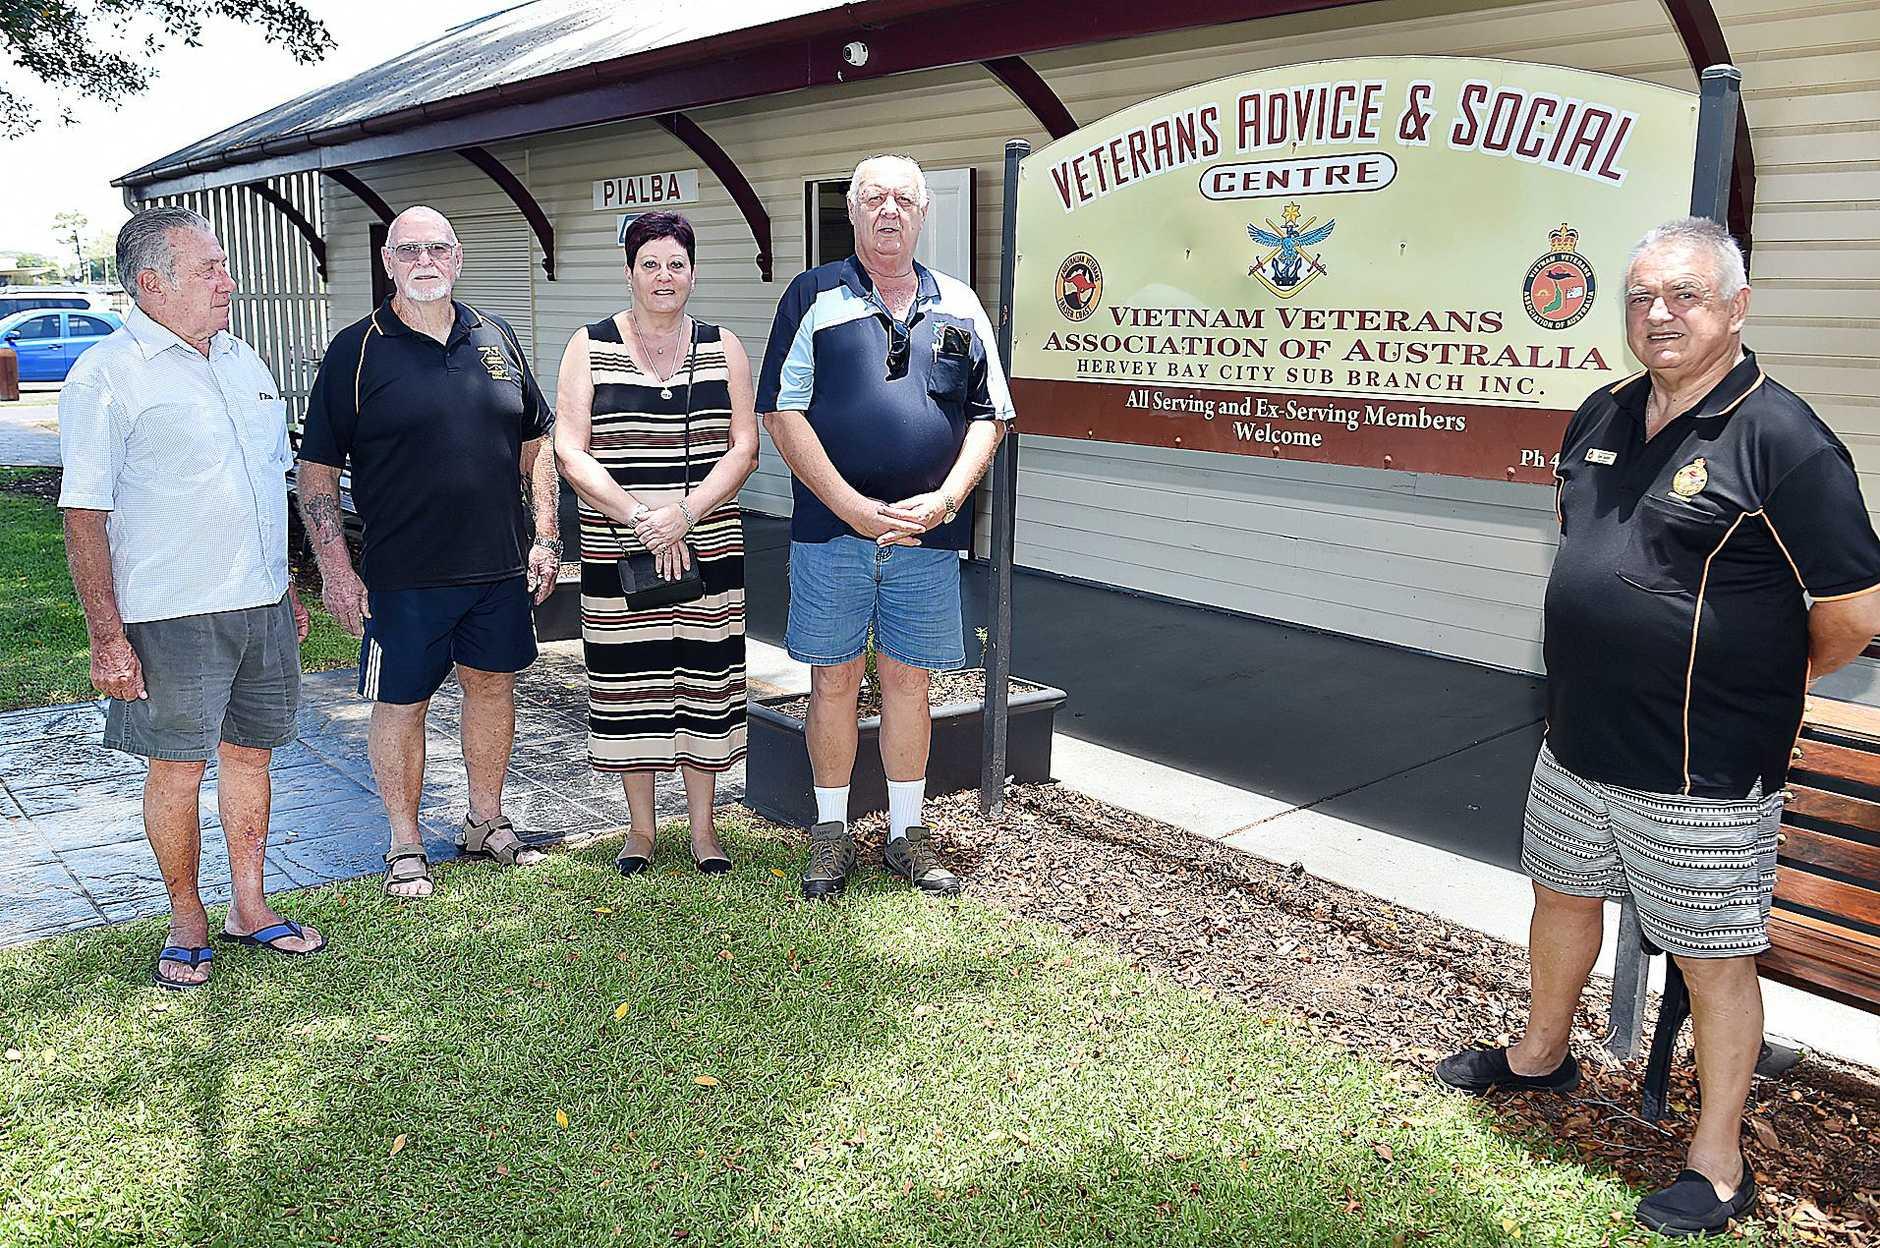 VVAF members Trevor Hill, Barry English, Tess Dulka, Garry Forster and Bob Taylor of Vietnam Veterans Assoc.